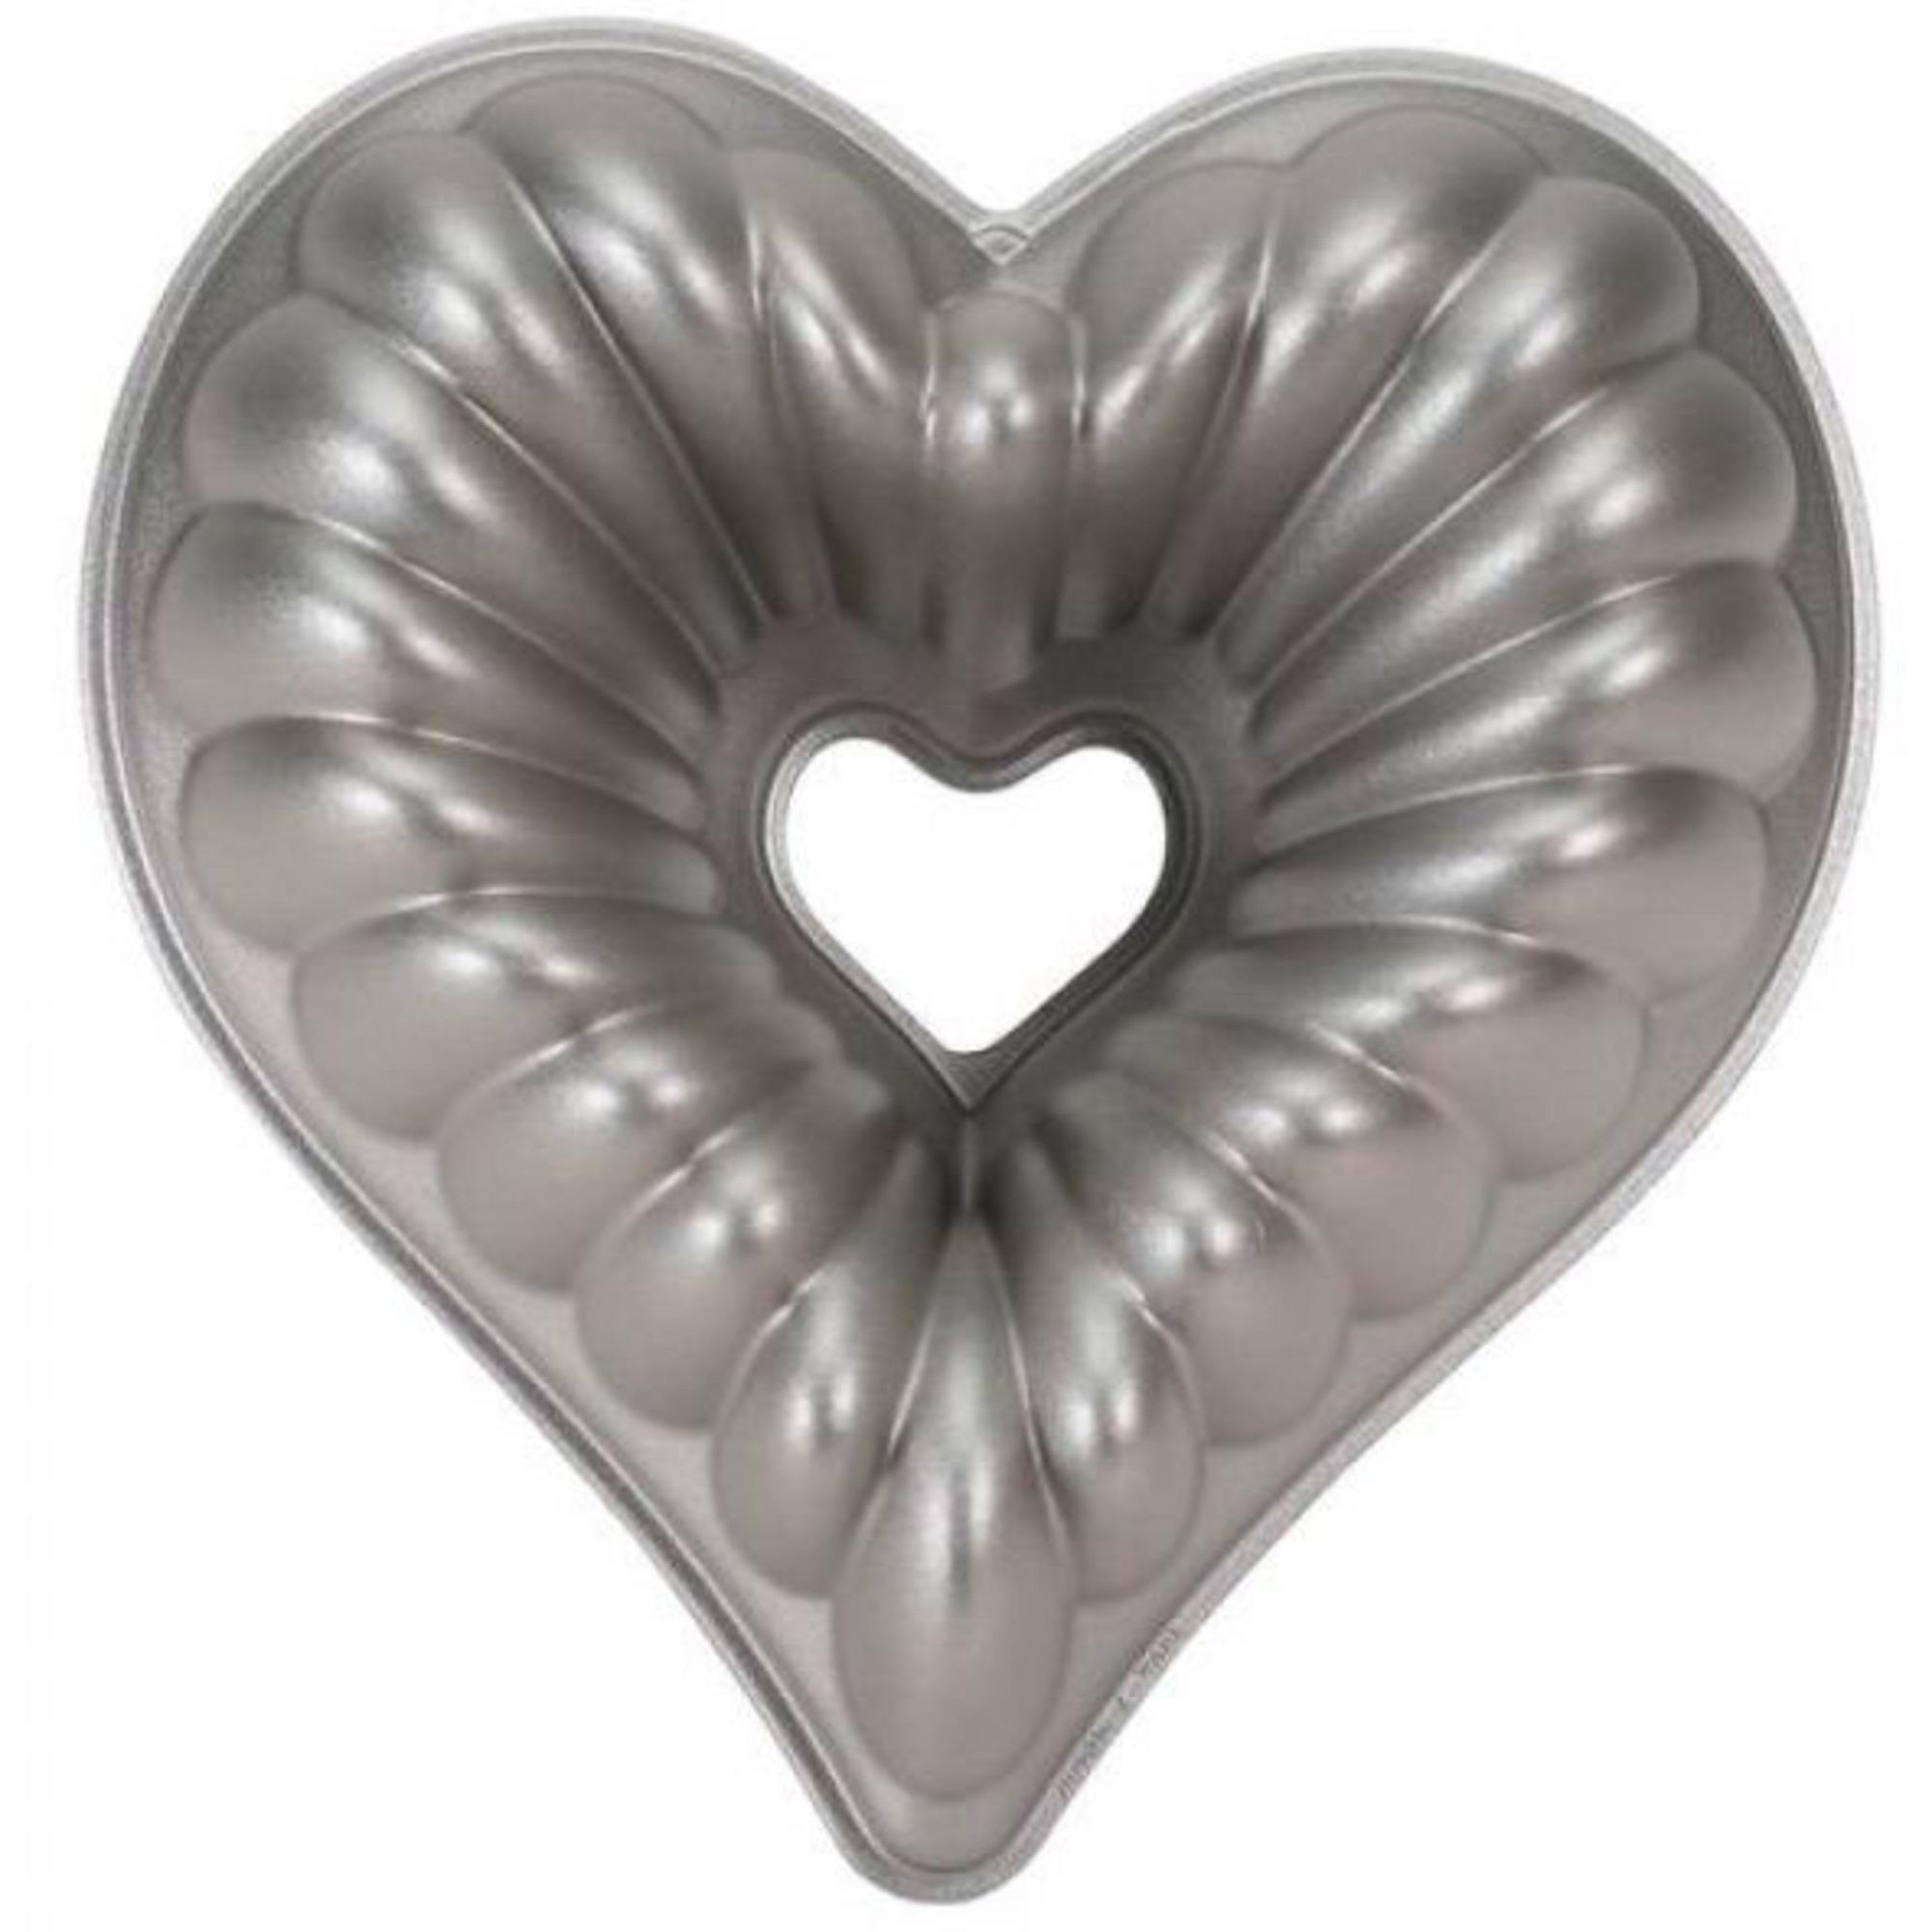 Nordic Ware Kakform Elegant Heart